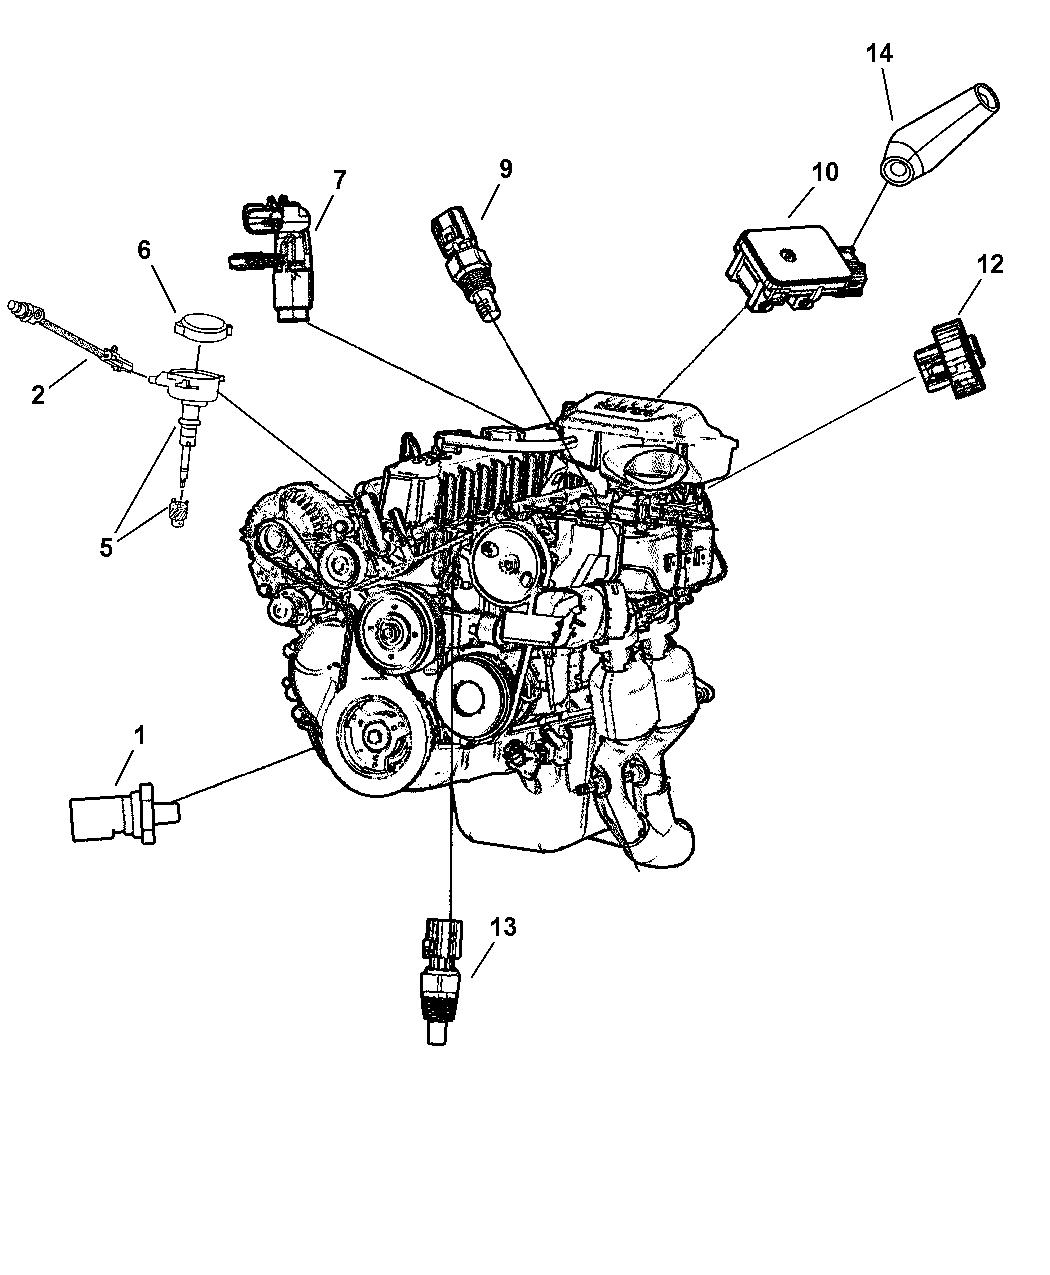 2005 Jeep Wrangler Sensors - Engine - Mopar Parts Giant